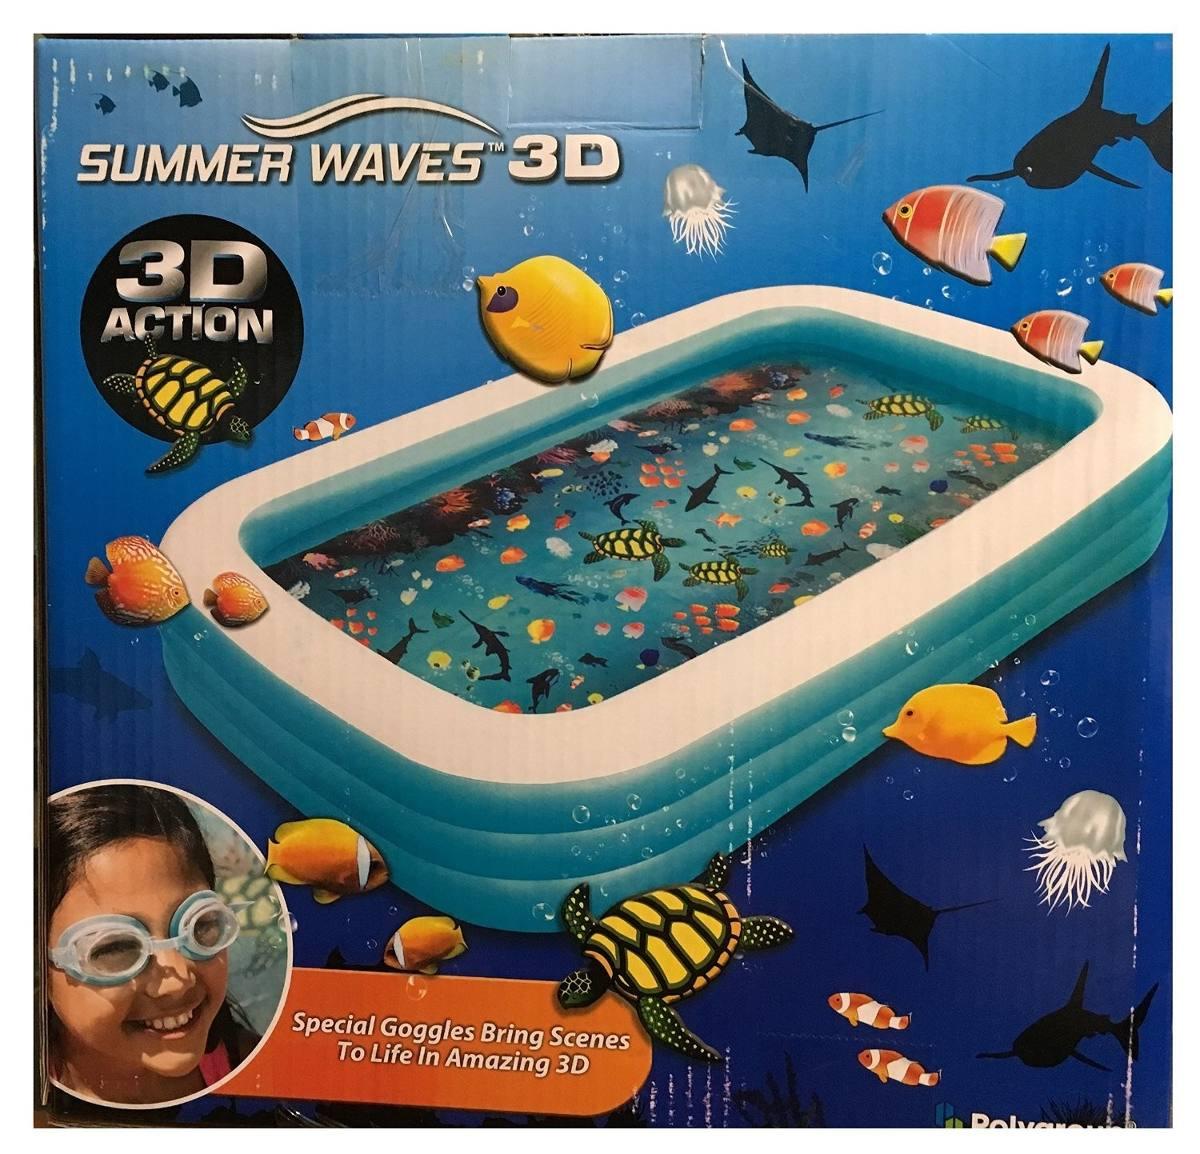 Alberca piscina inflable familiar 3d nuevo 1 en for Piscina 3d